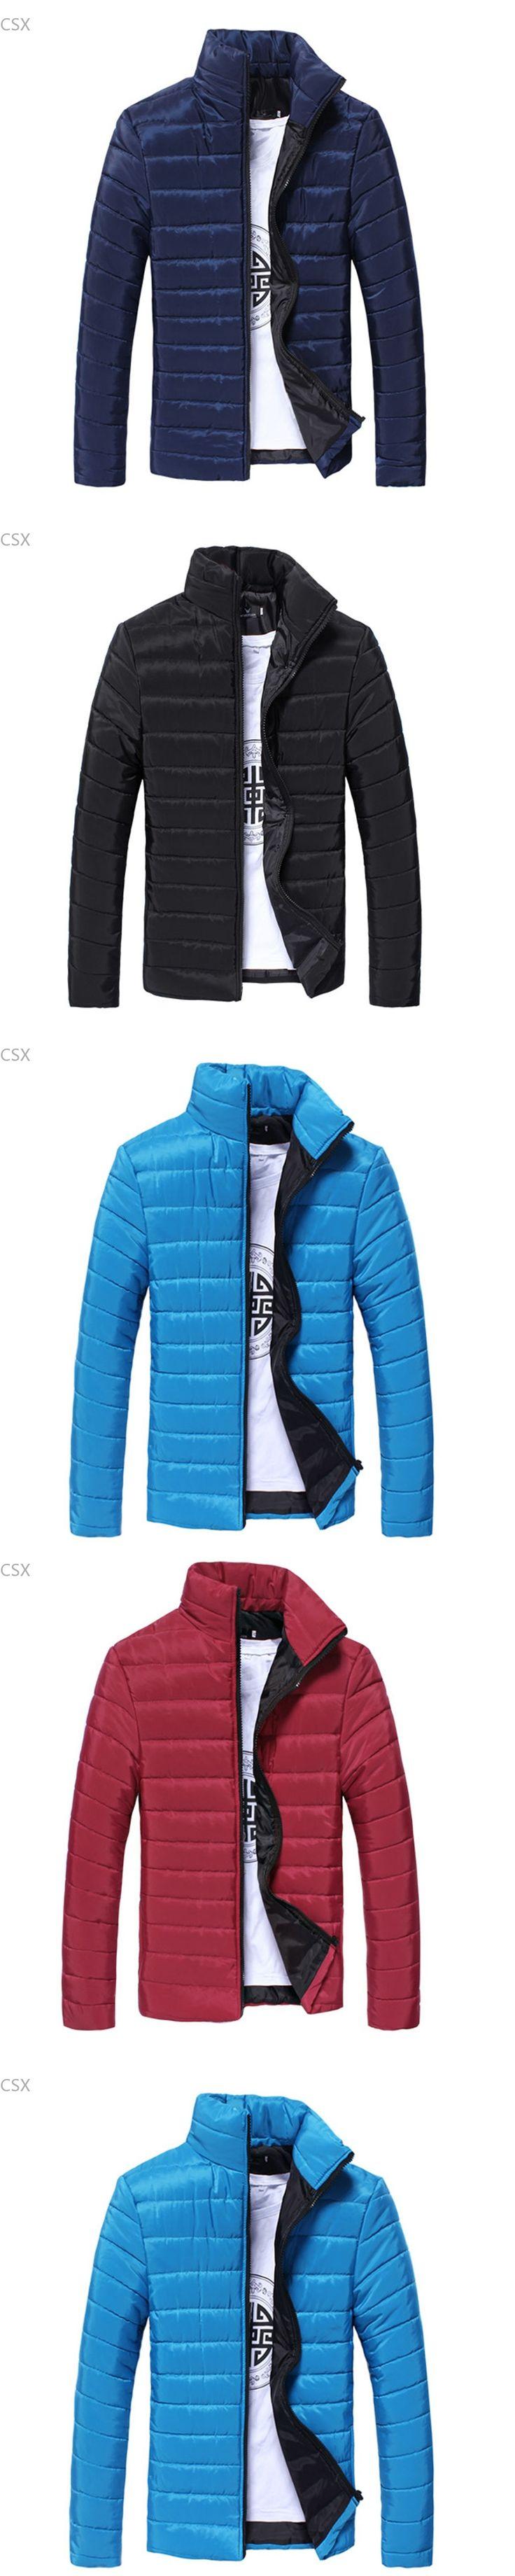 Alishebuy 2014 Men's Parkas Jacket Winter Cotton Coats Mens Wadded Jacket Man Jackets Warm Coat Down Padded Coat 29